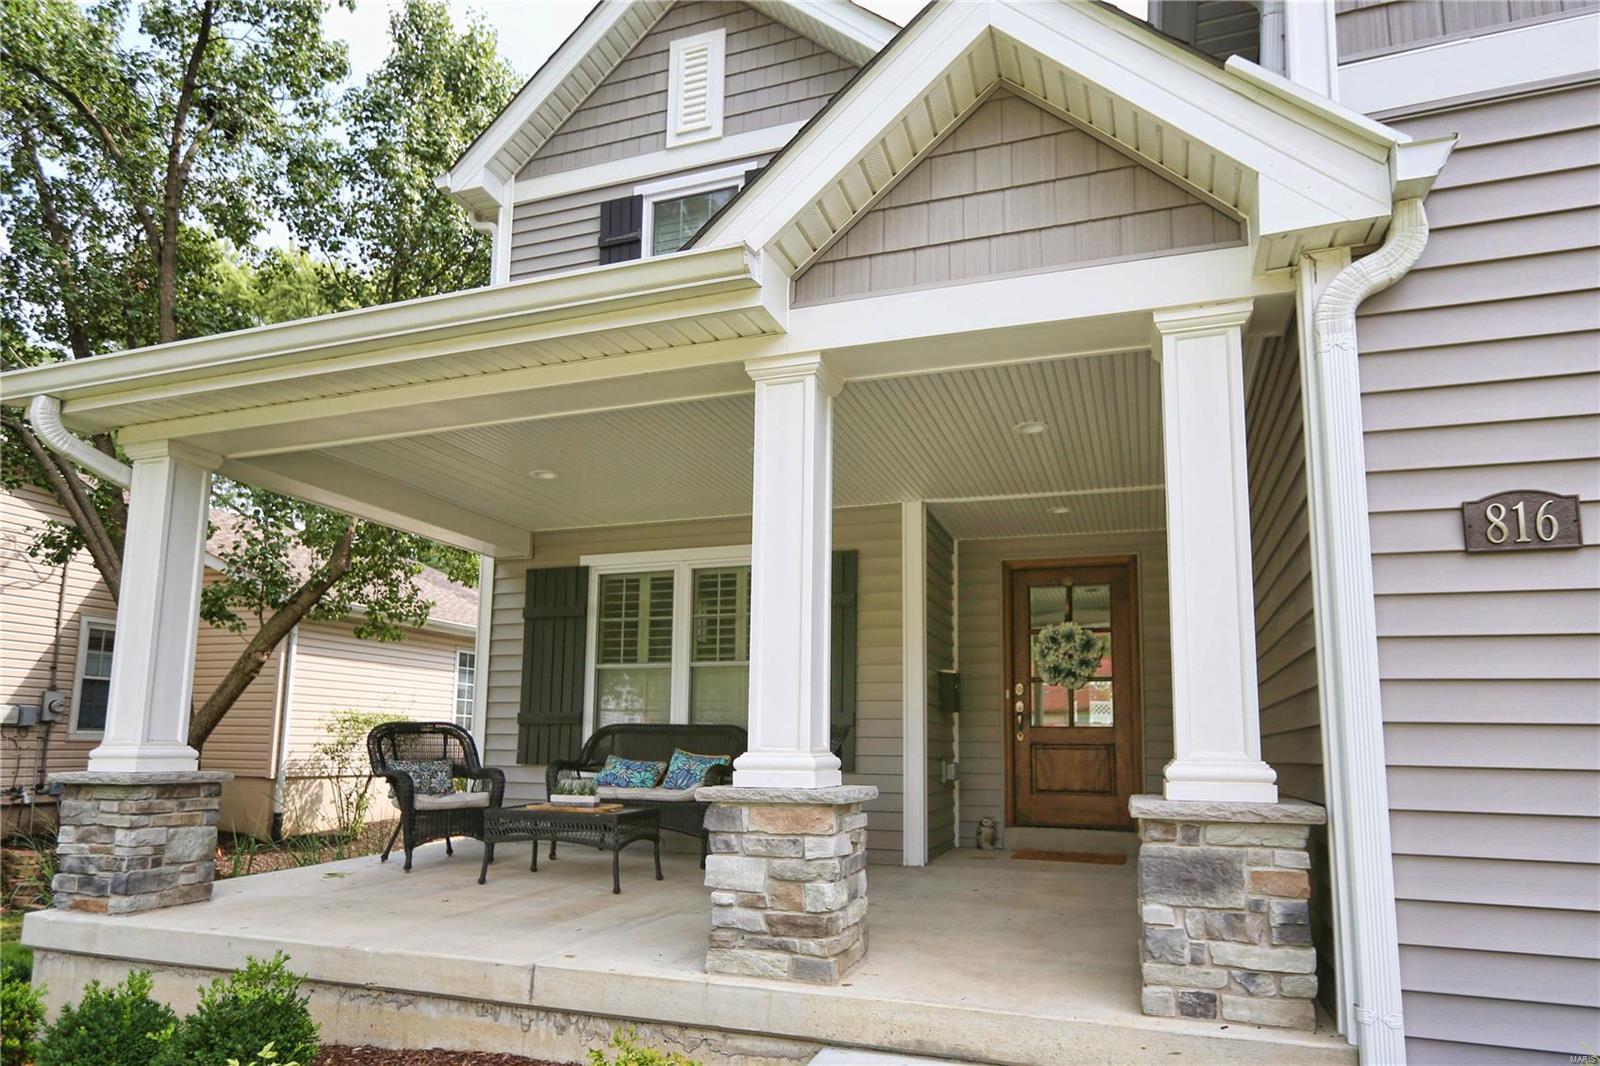 816 N Geyer Property Photo - Kirkwood, MO real estate listing